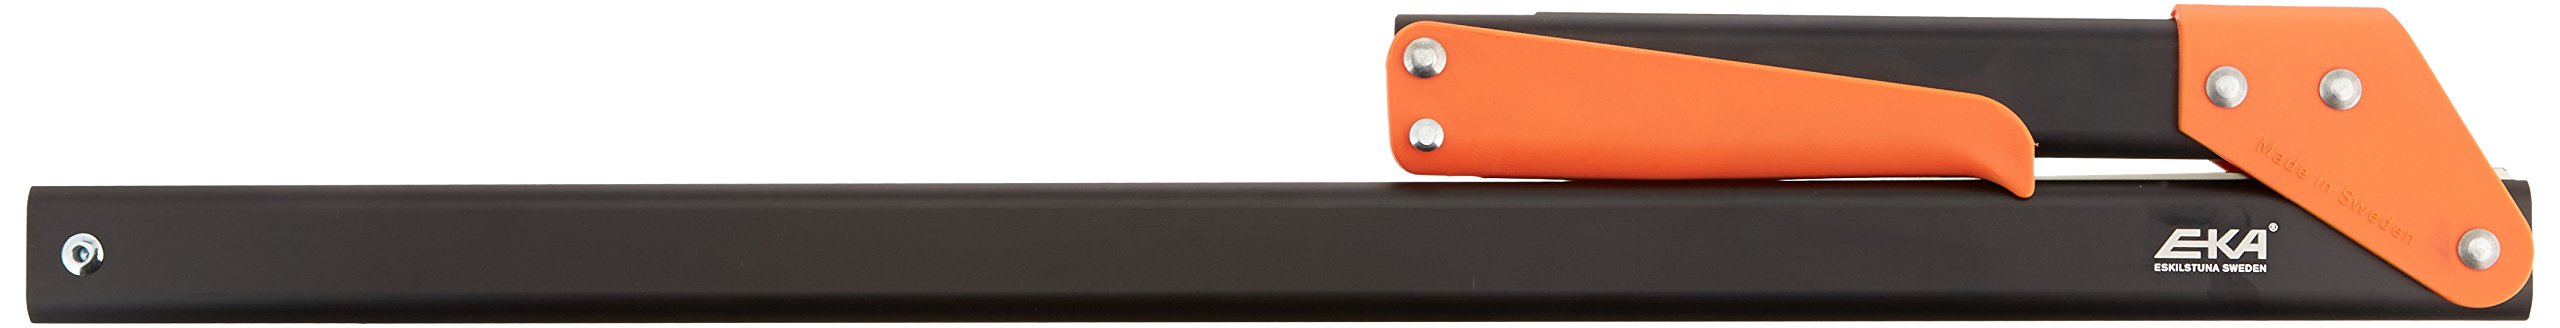 EKA Viking Combi Compact Saw, 21-Inch, Black with Orange Handle by EKA (Image #3)